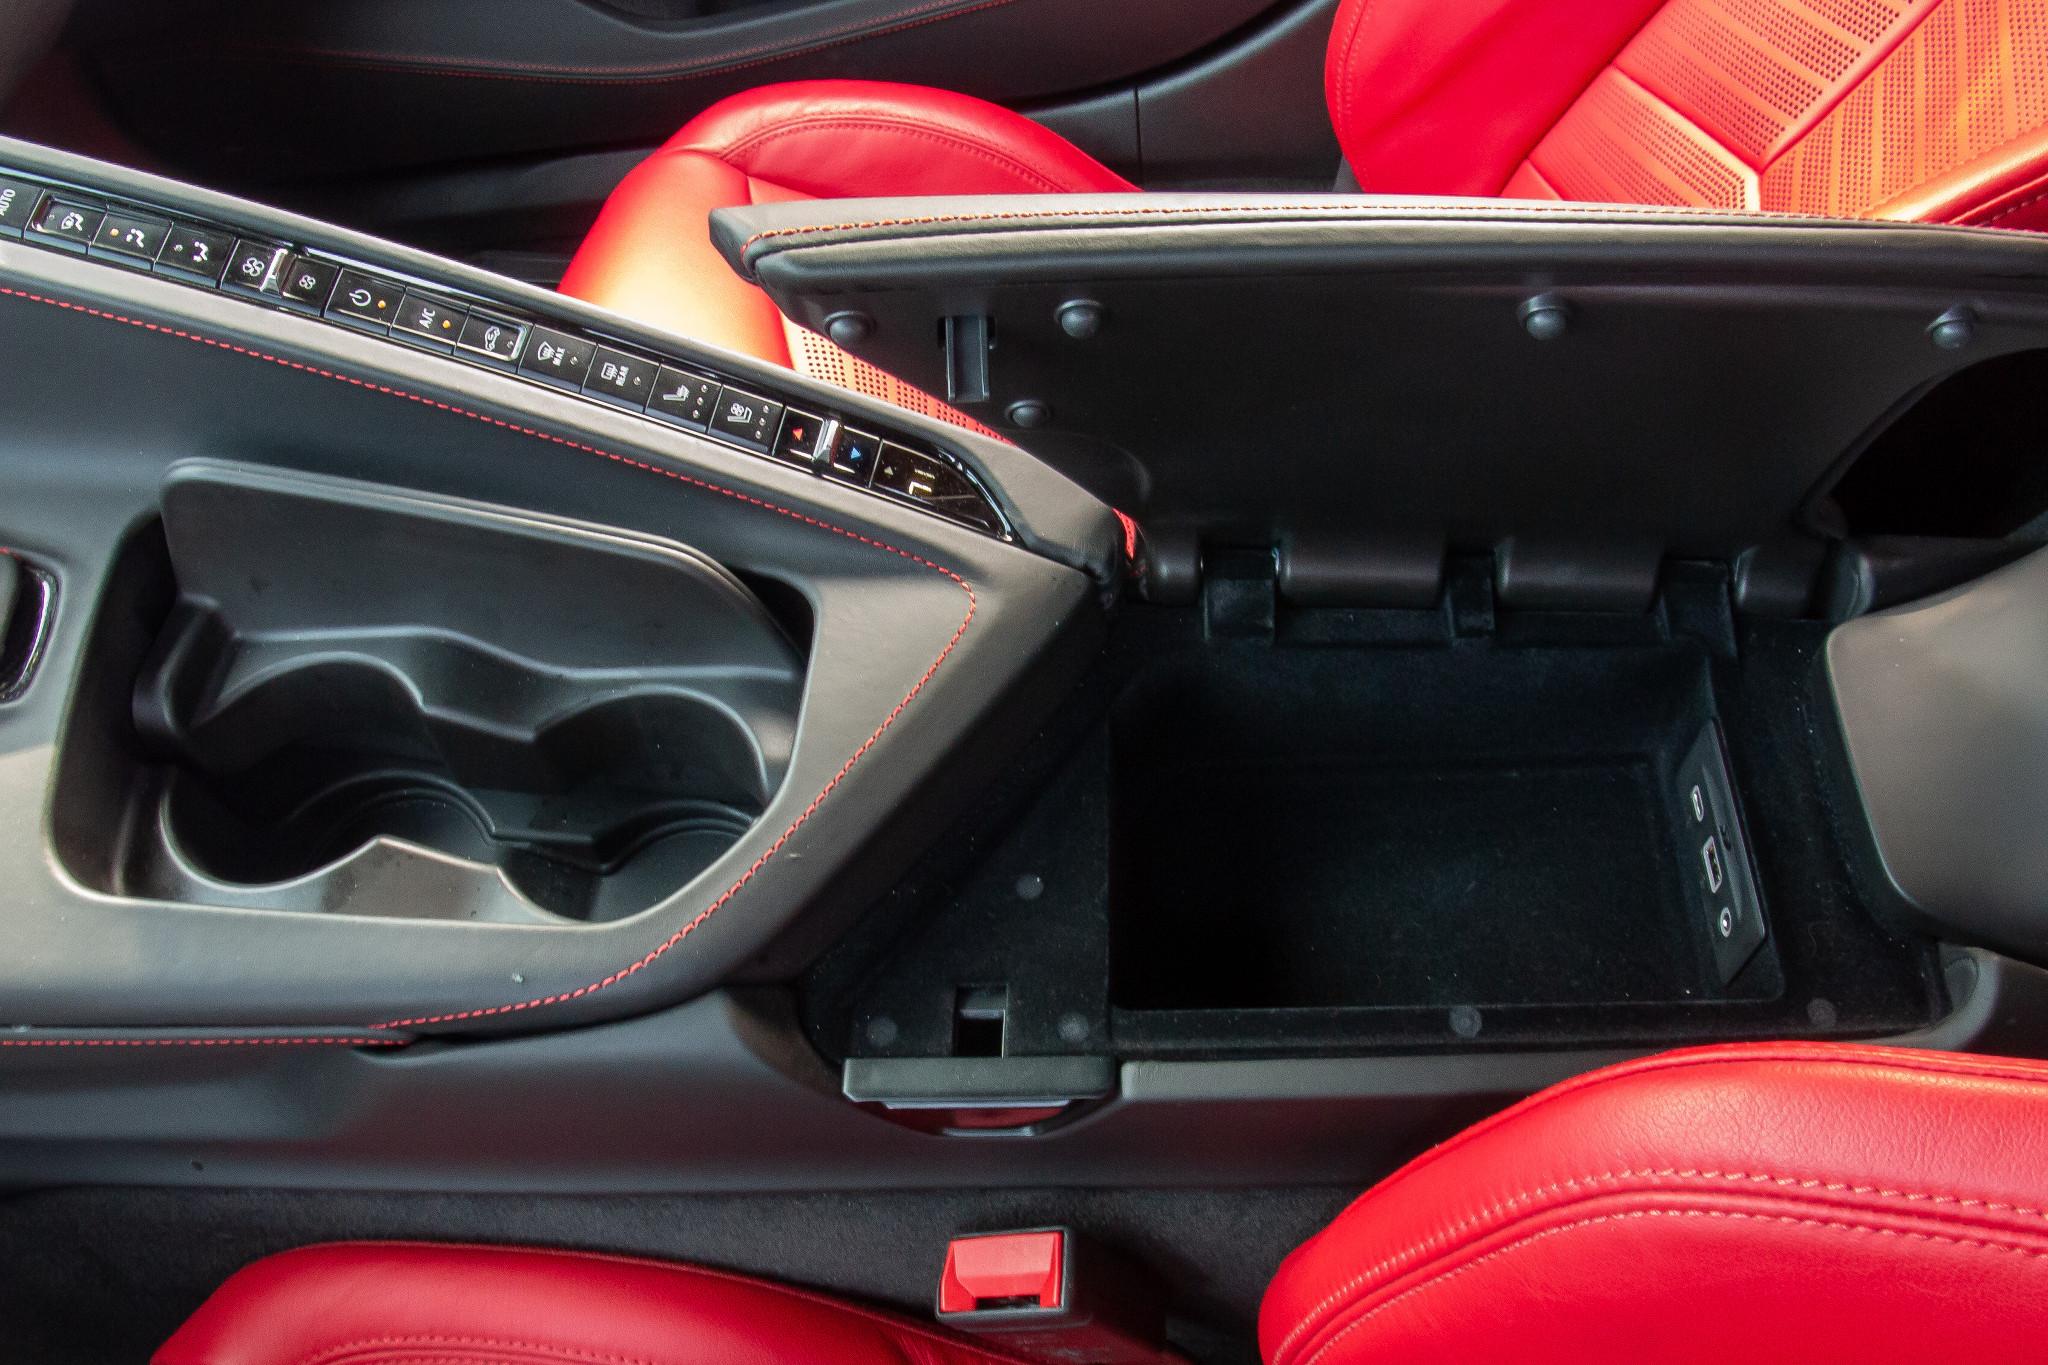 chevrolet-corvette-z51-2020-23-center-console--interior--storage.jpg